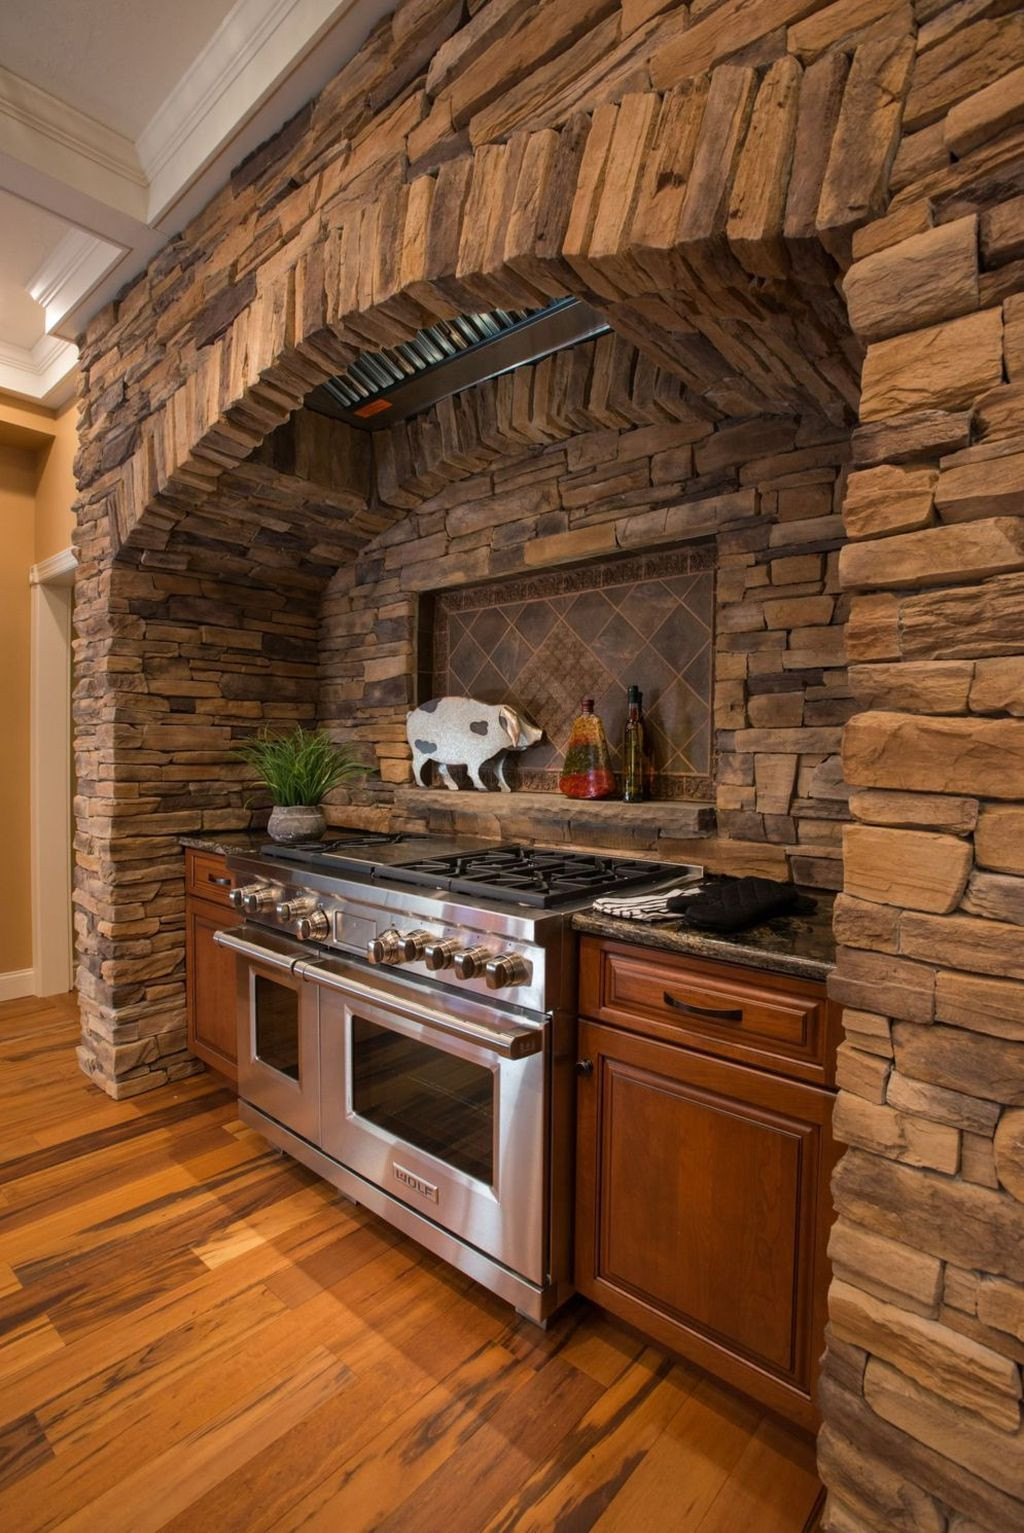 32 stunning rustic kitchen design and decor ideas rustic kitchen design rustic interior style on kitchen decor themes rustic id=21623